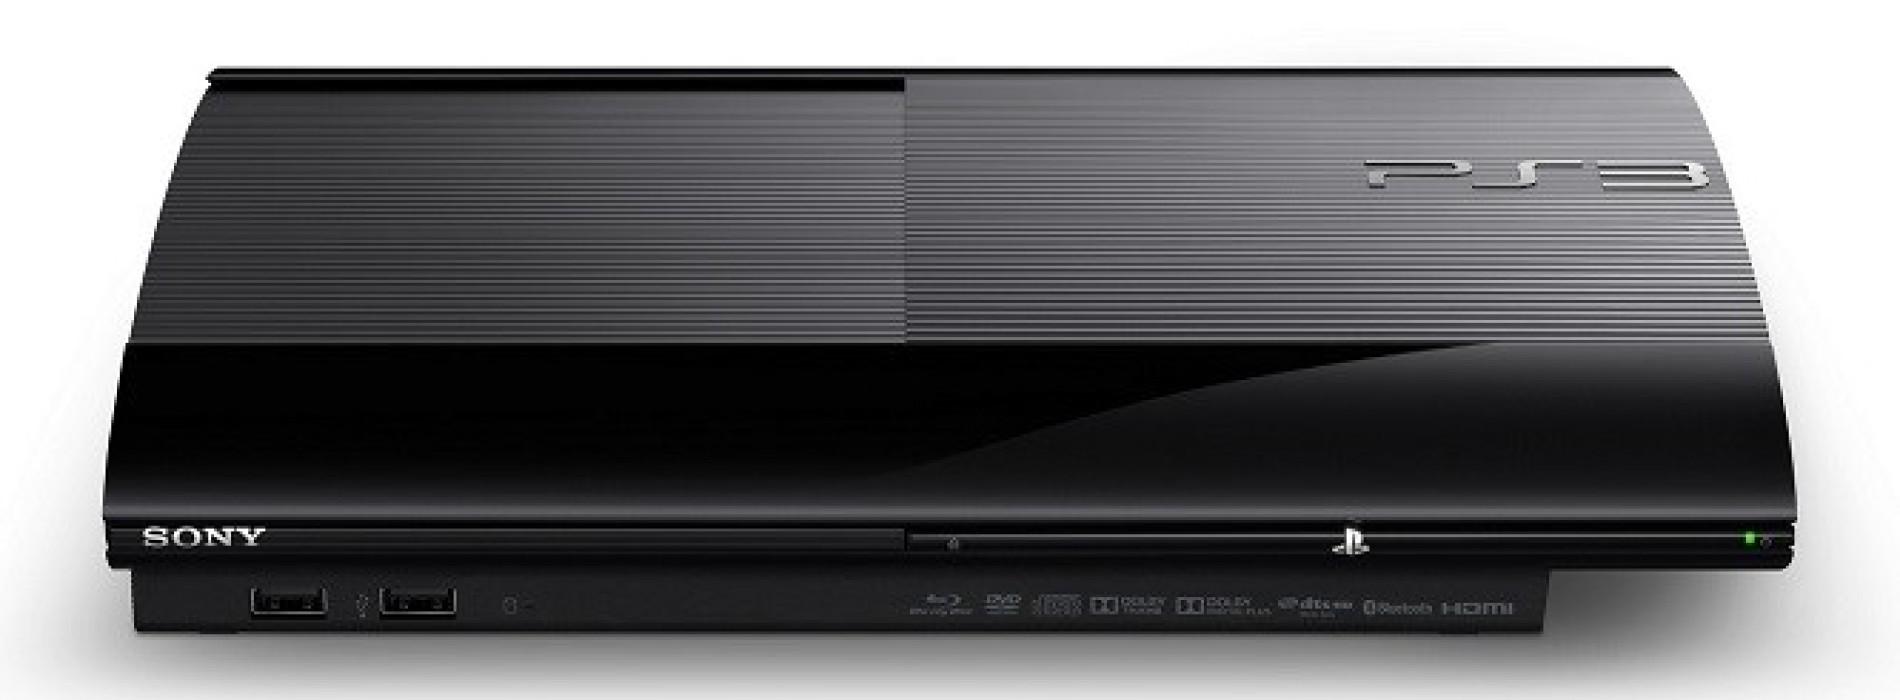 Ремонт Sony PlayStation 3 super slim